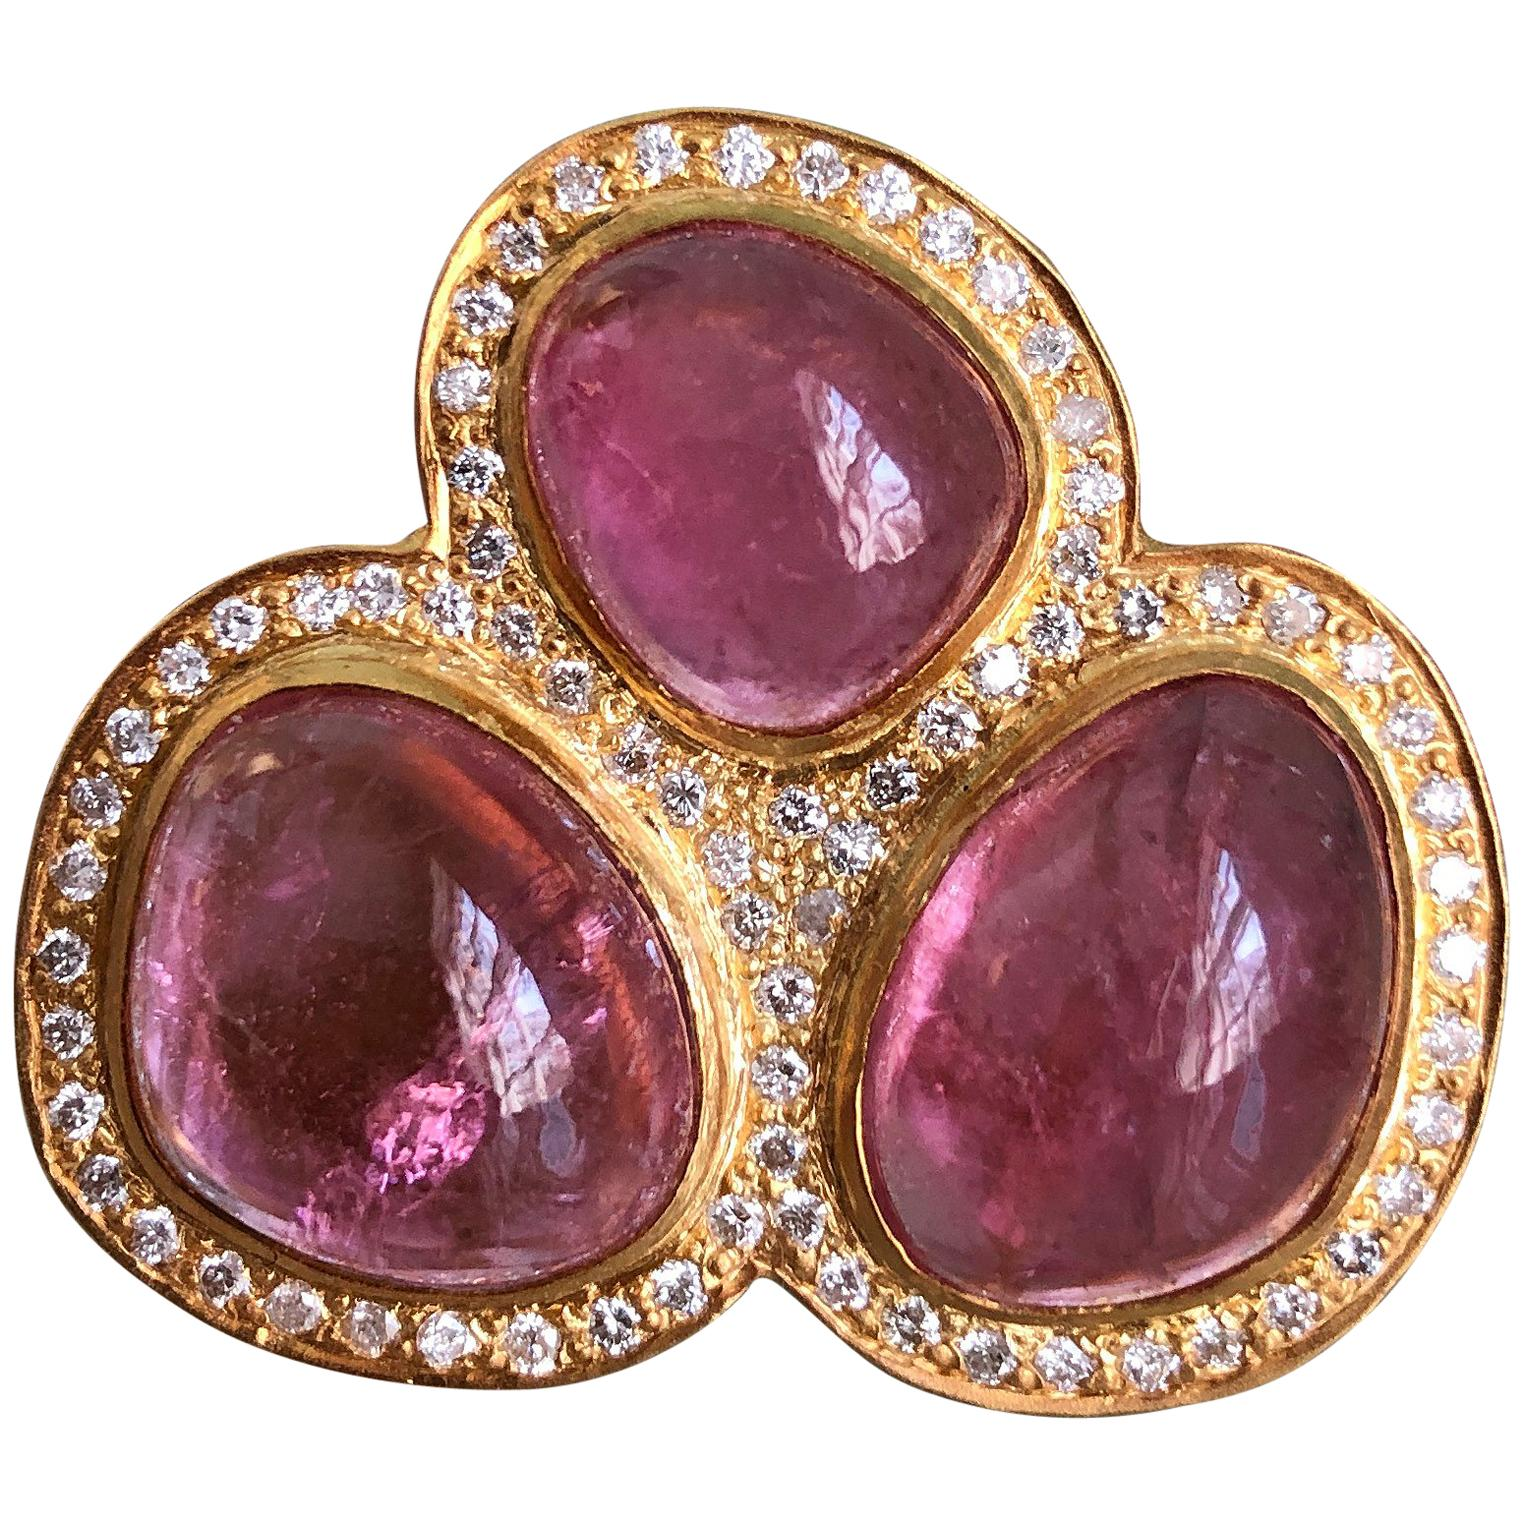 22.91 Carat Pink Tourmaline Diamond Cocktail Ring by Lauren Harper